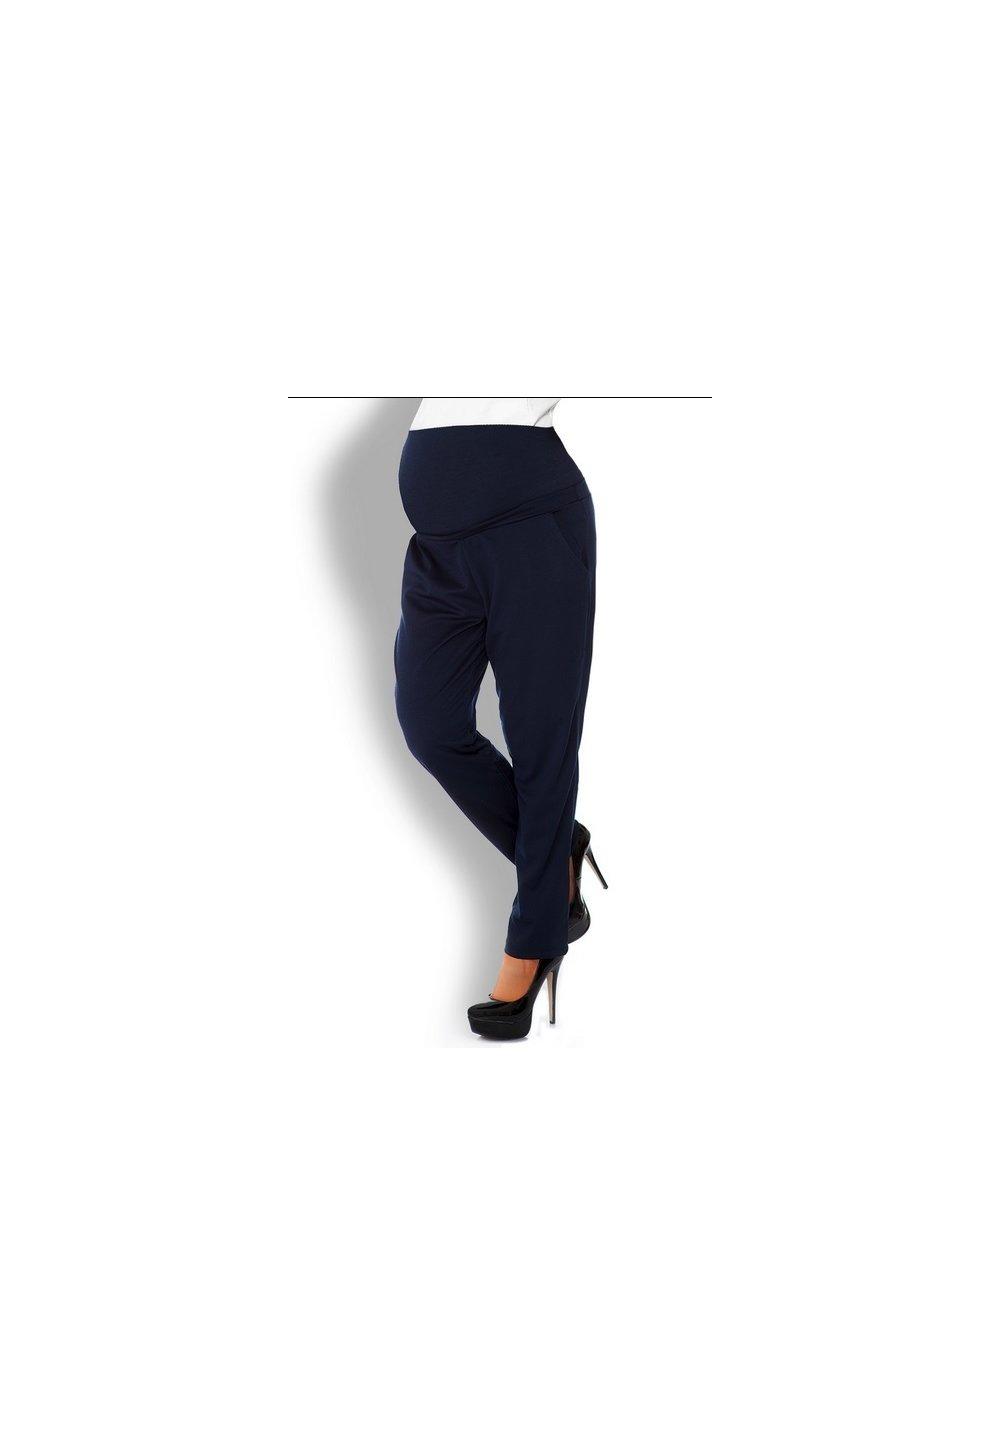 Pantaloni gravide, Pocket bluemarin imagine